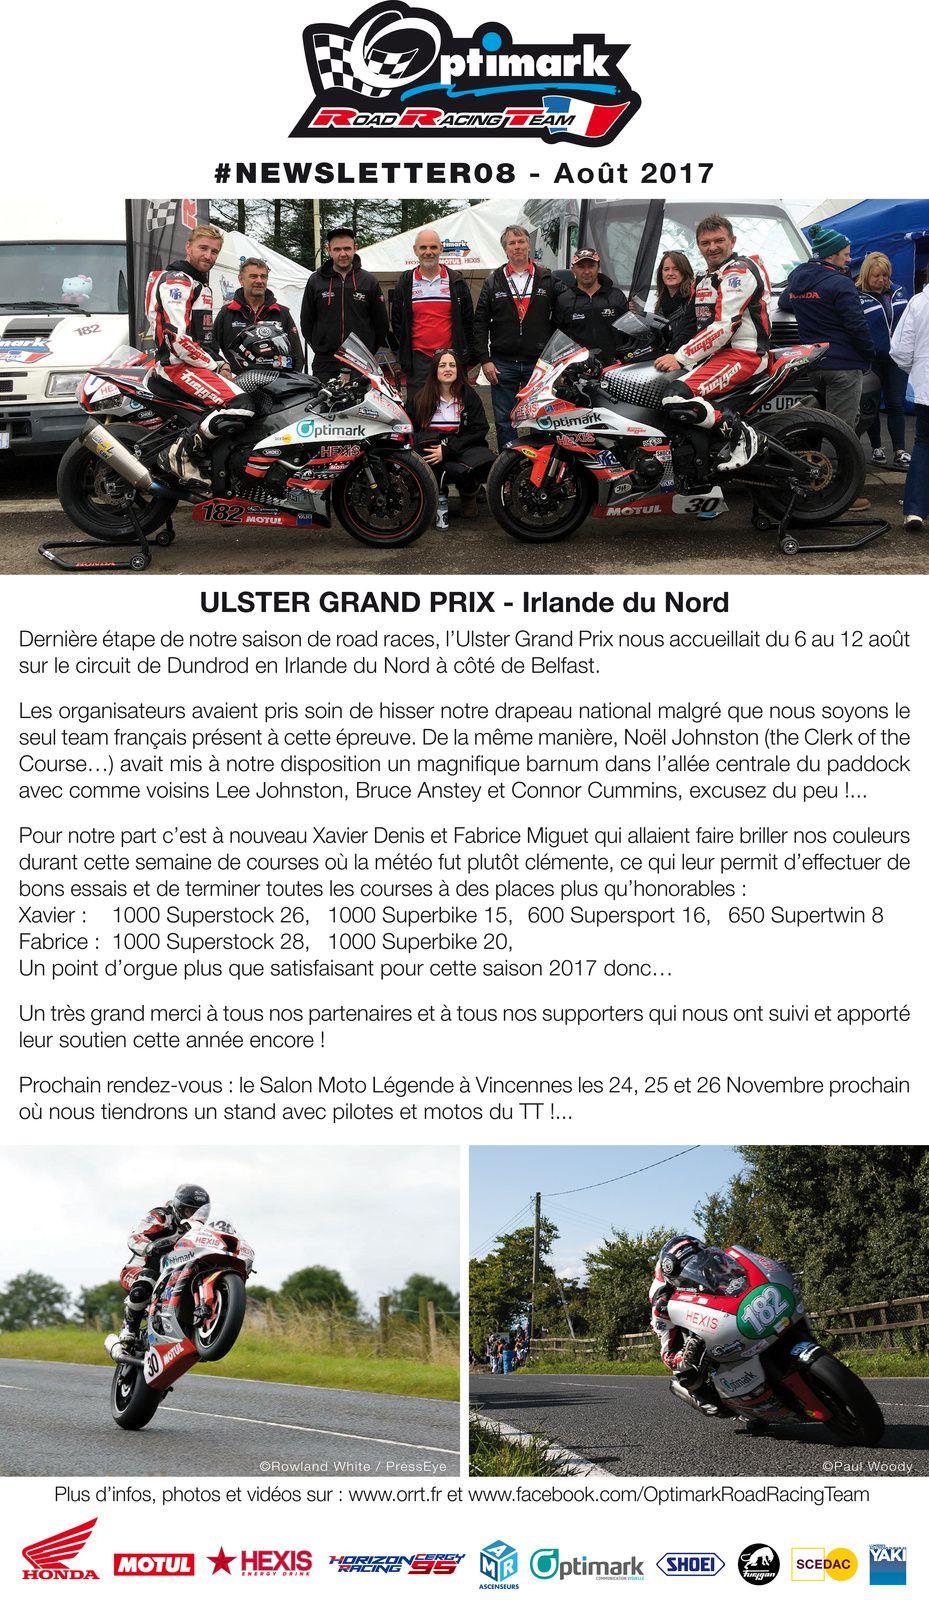 Newsletter #8 Optimark Road Racing Team